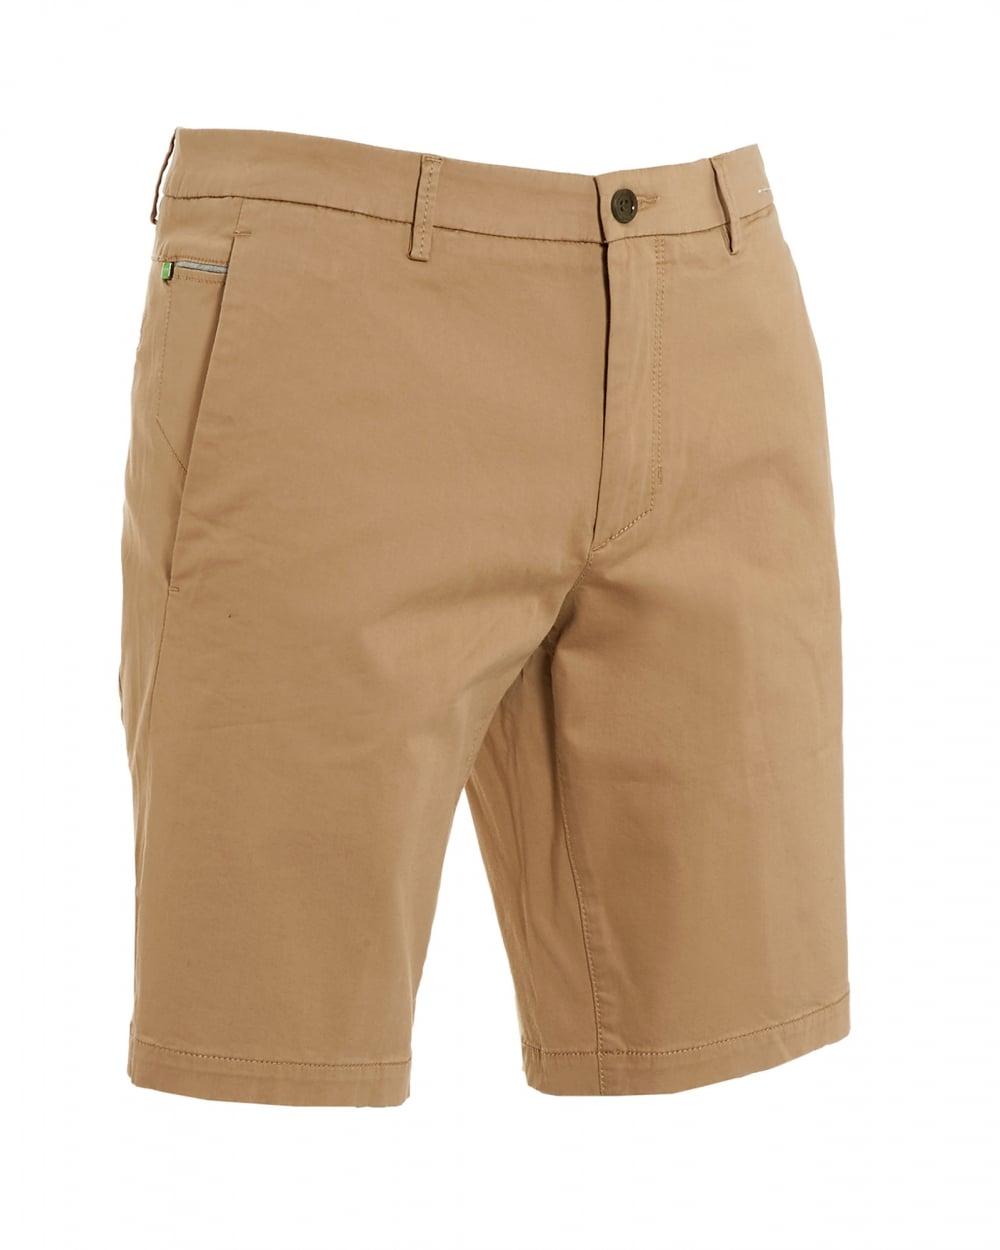 890d94e45ab0 Hugo Boss Green Mens Liem4-W Beige Cotton Slim Fit Shorts